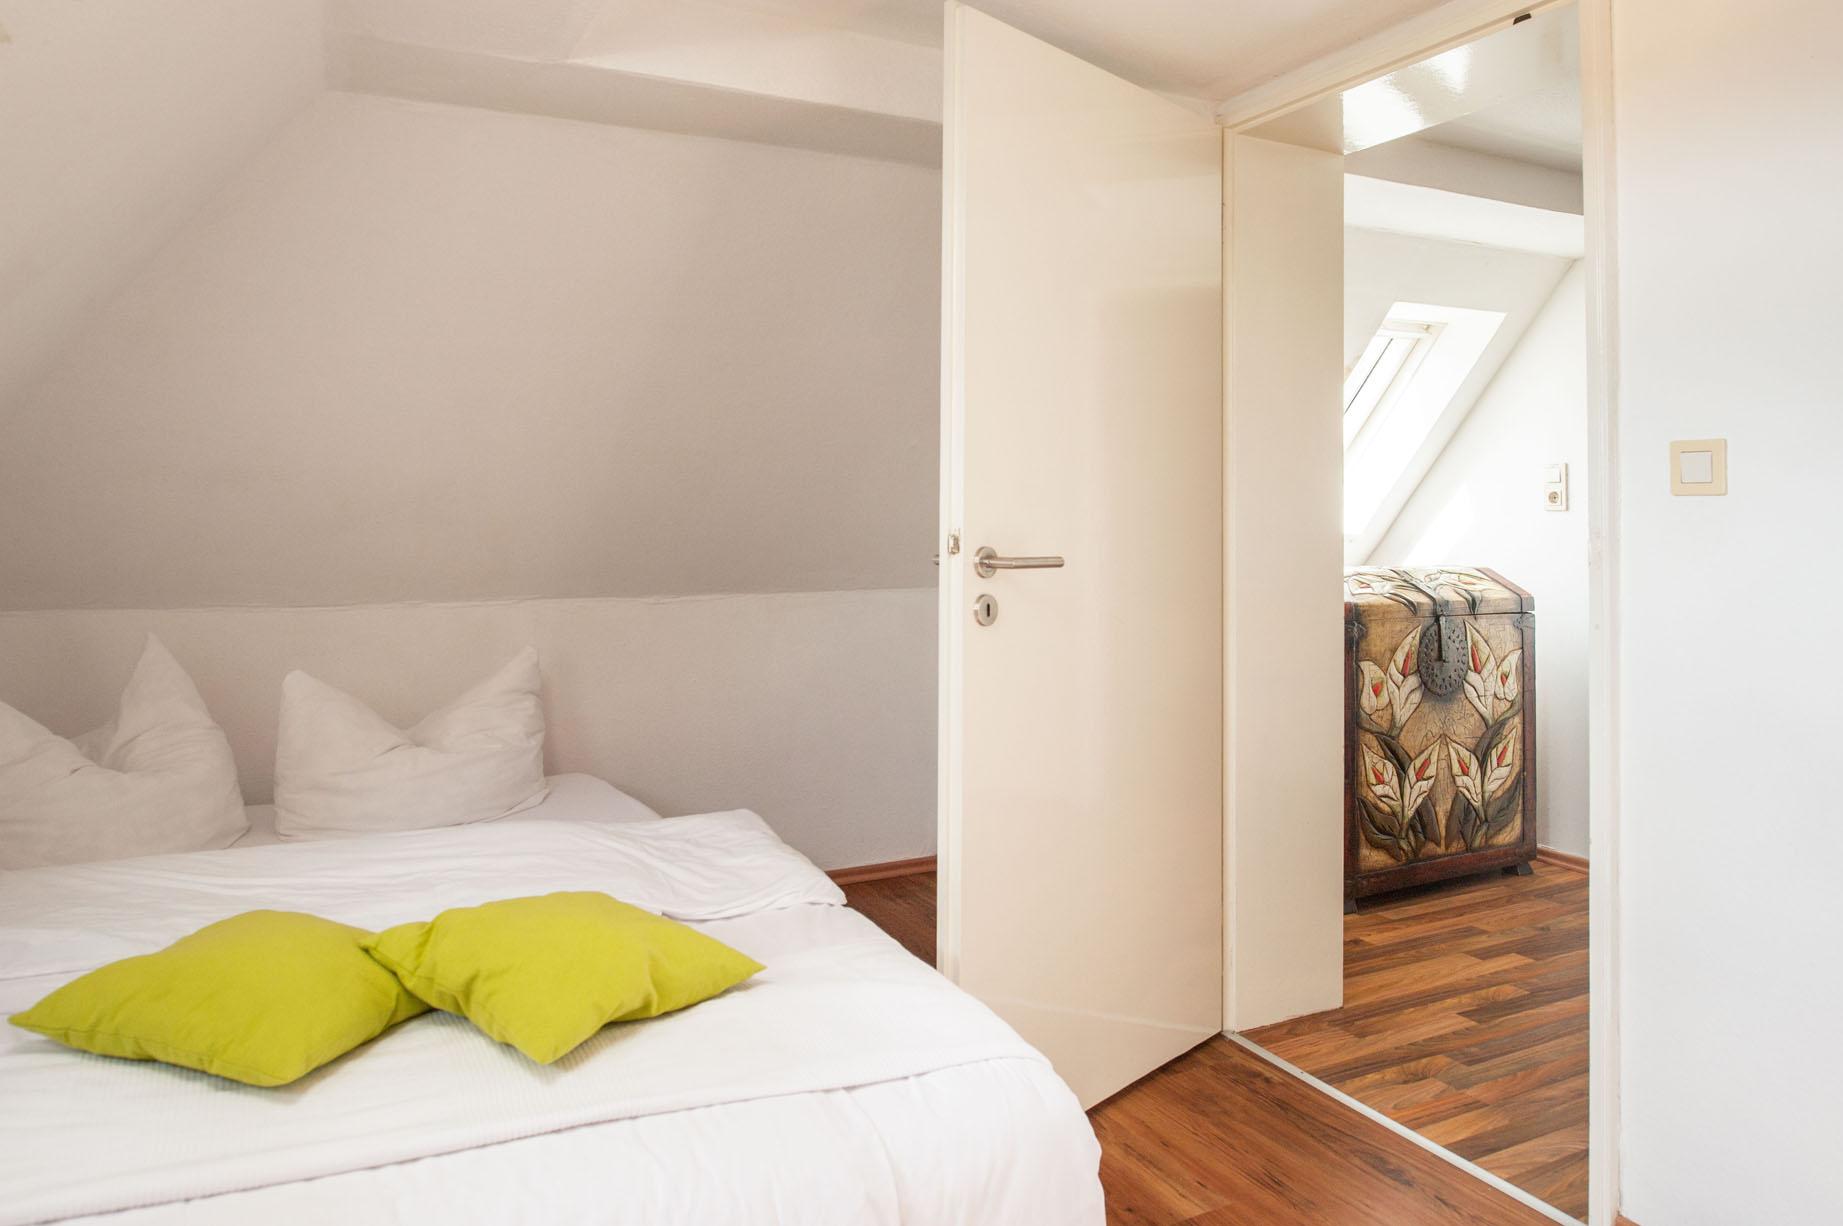 Vakantiewoning 2 - 6 personen Beieren Altmühltal 3 slaapkamers